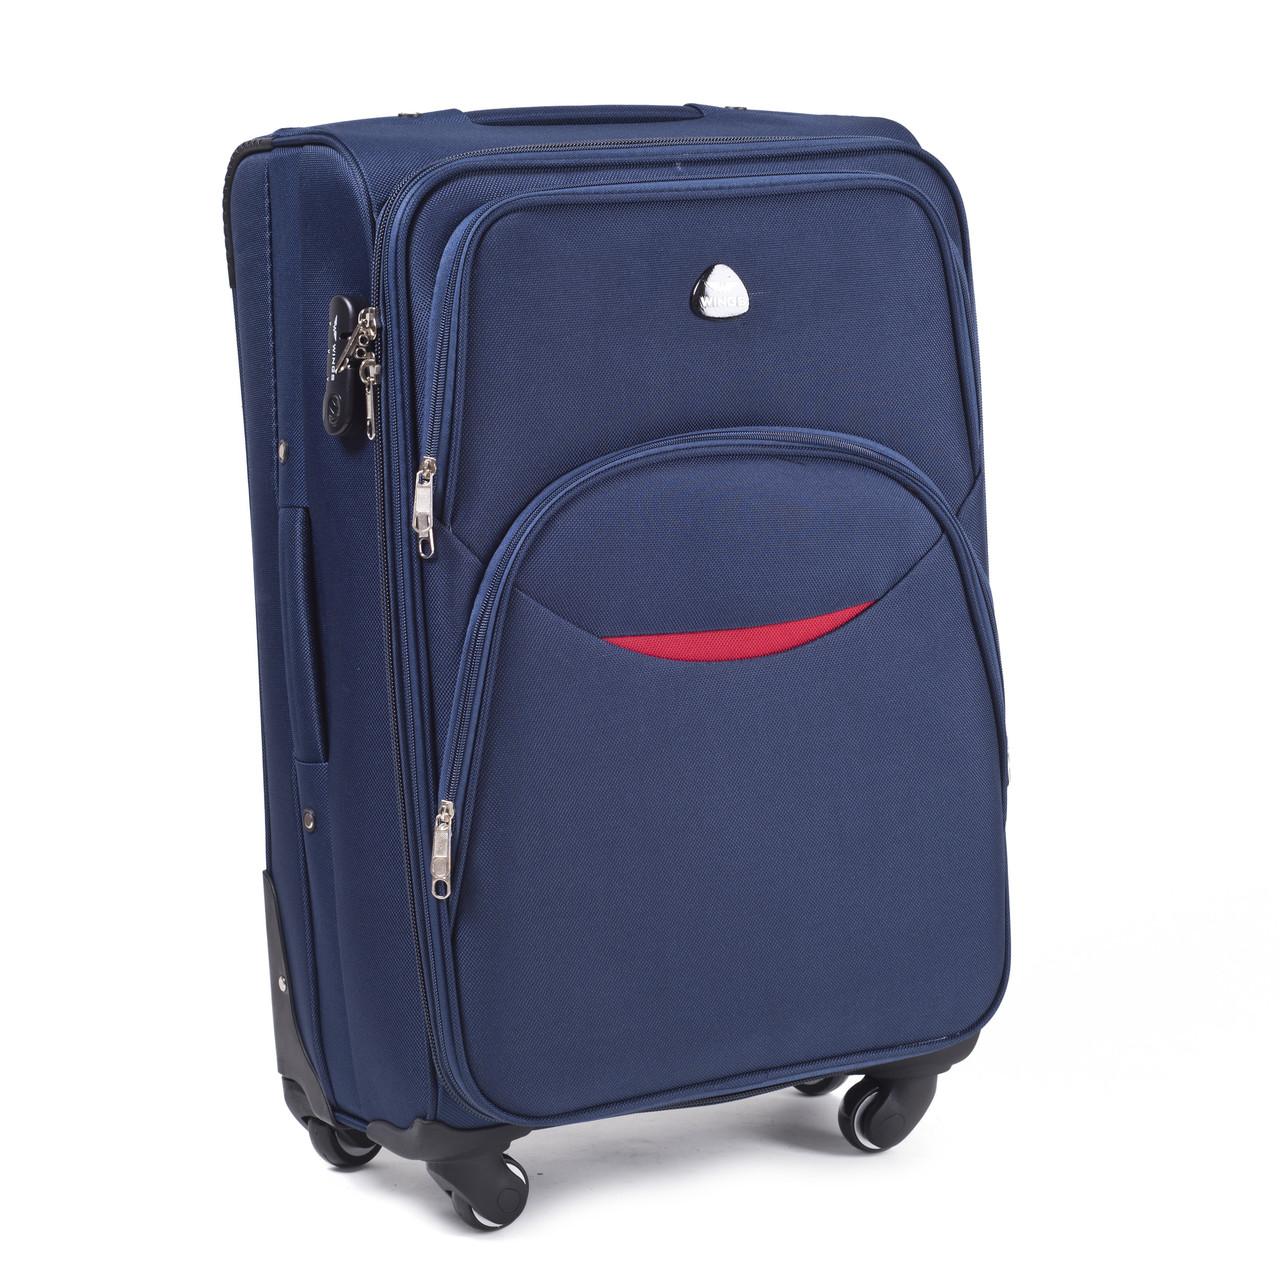 Большой тканевый чемодан Wings 1708 на 4 колесах синий, фото 1